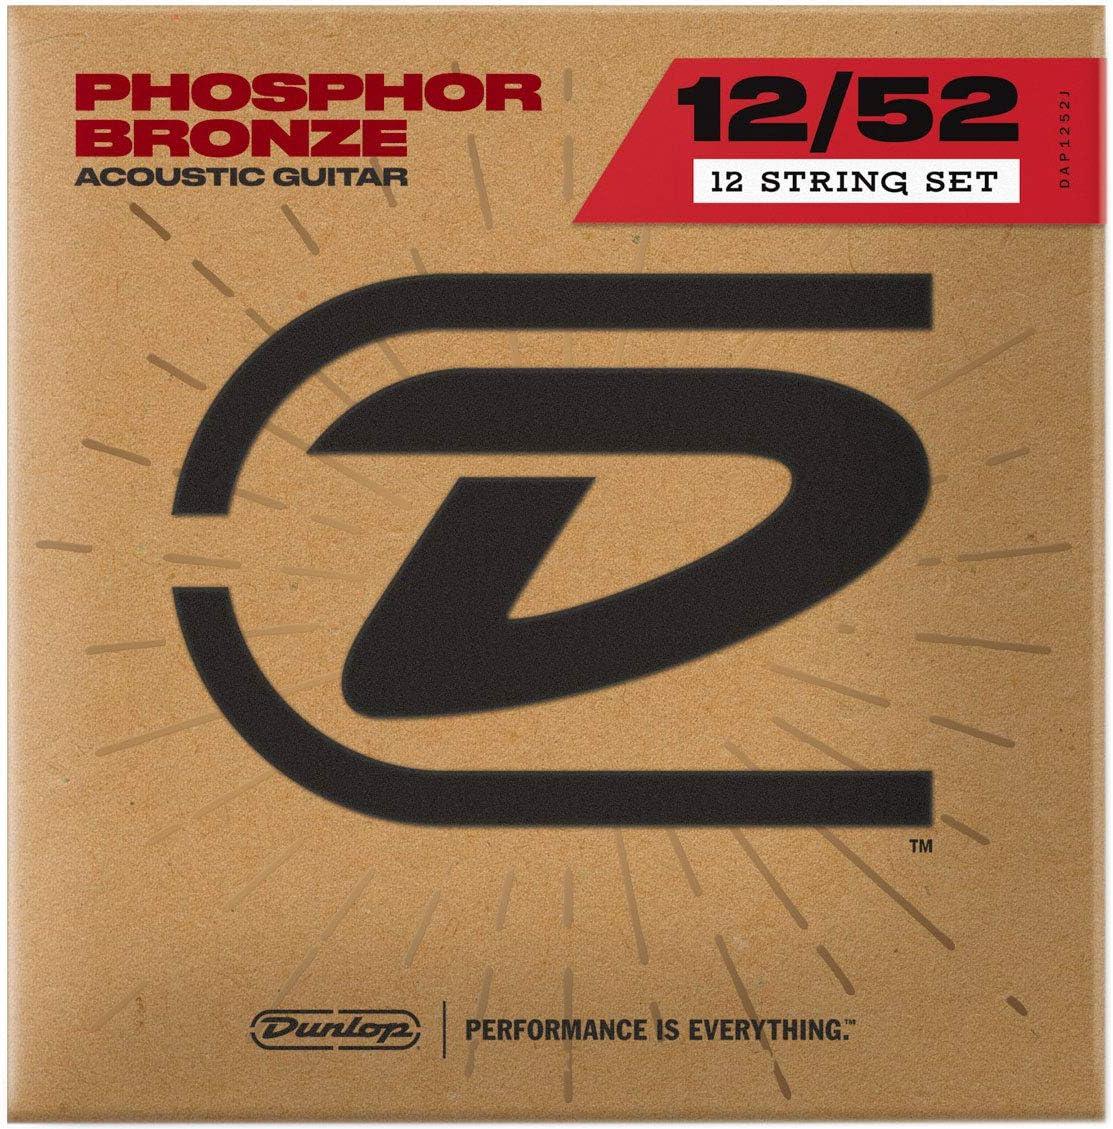 Dunlop Recommendation Seattle Mall DAP1252J Medium Phosphor Guitar Acoustic Strings Bronze